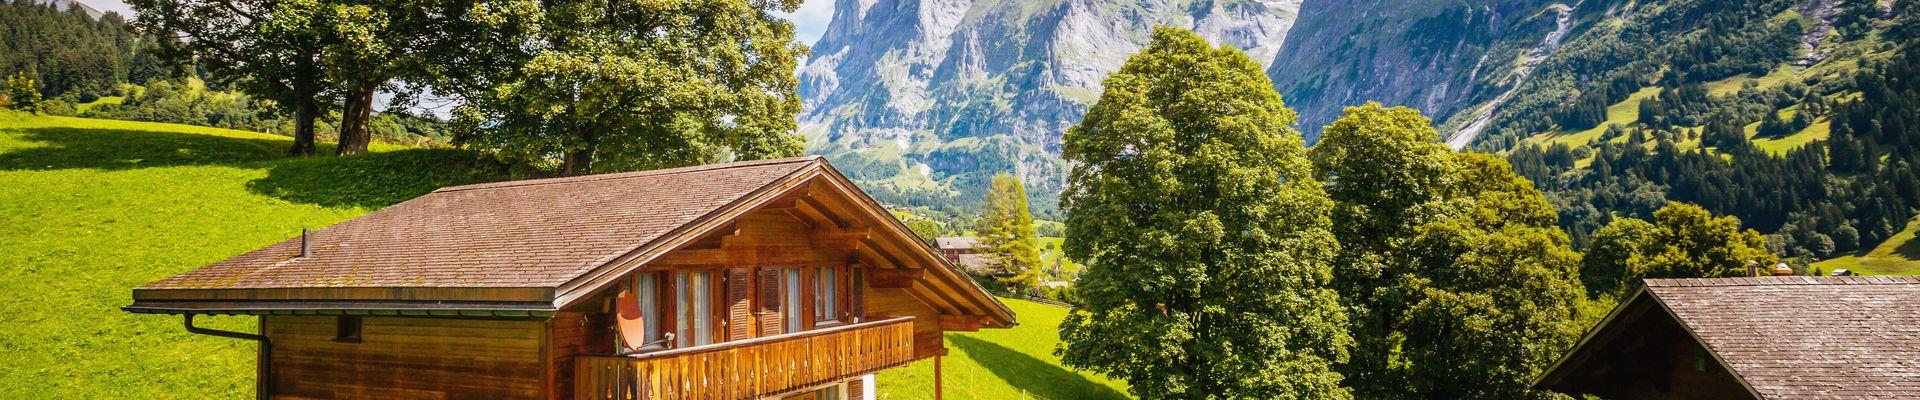 Wellnesshotels in Oberstdorf